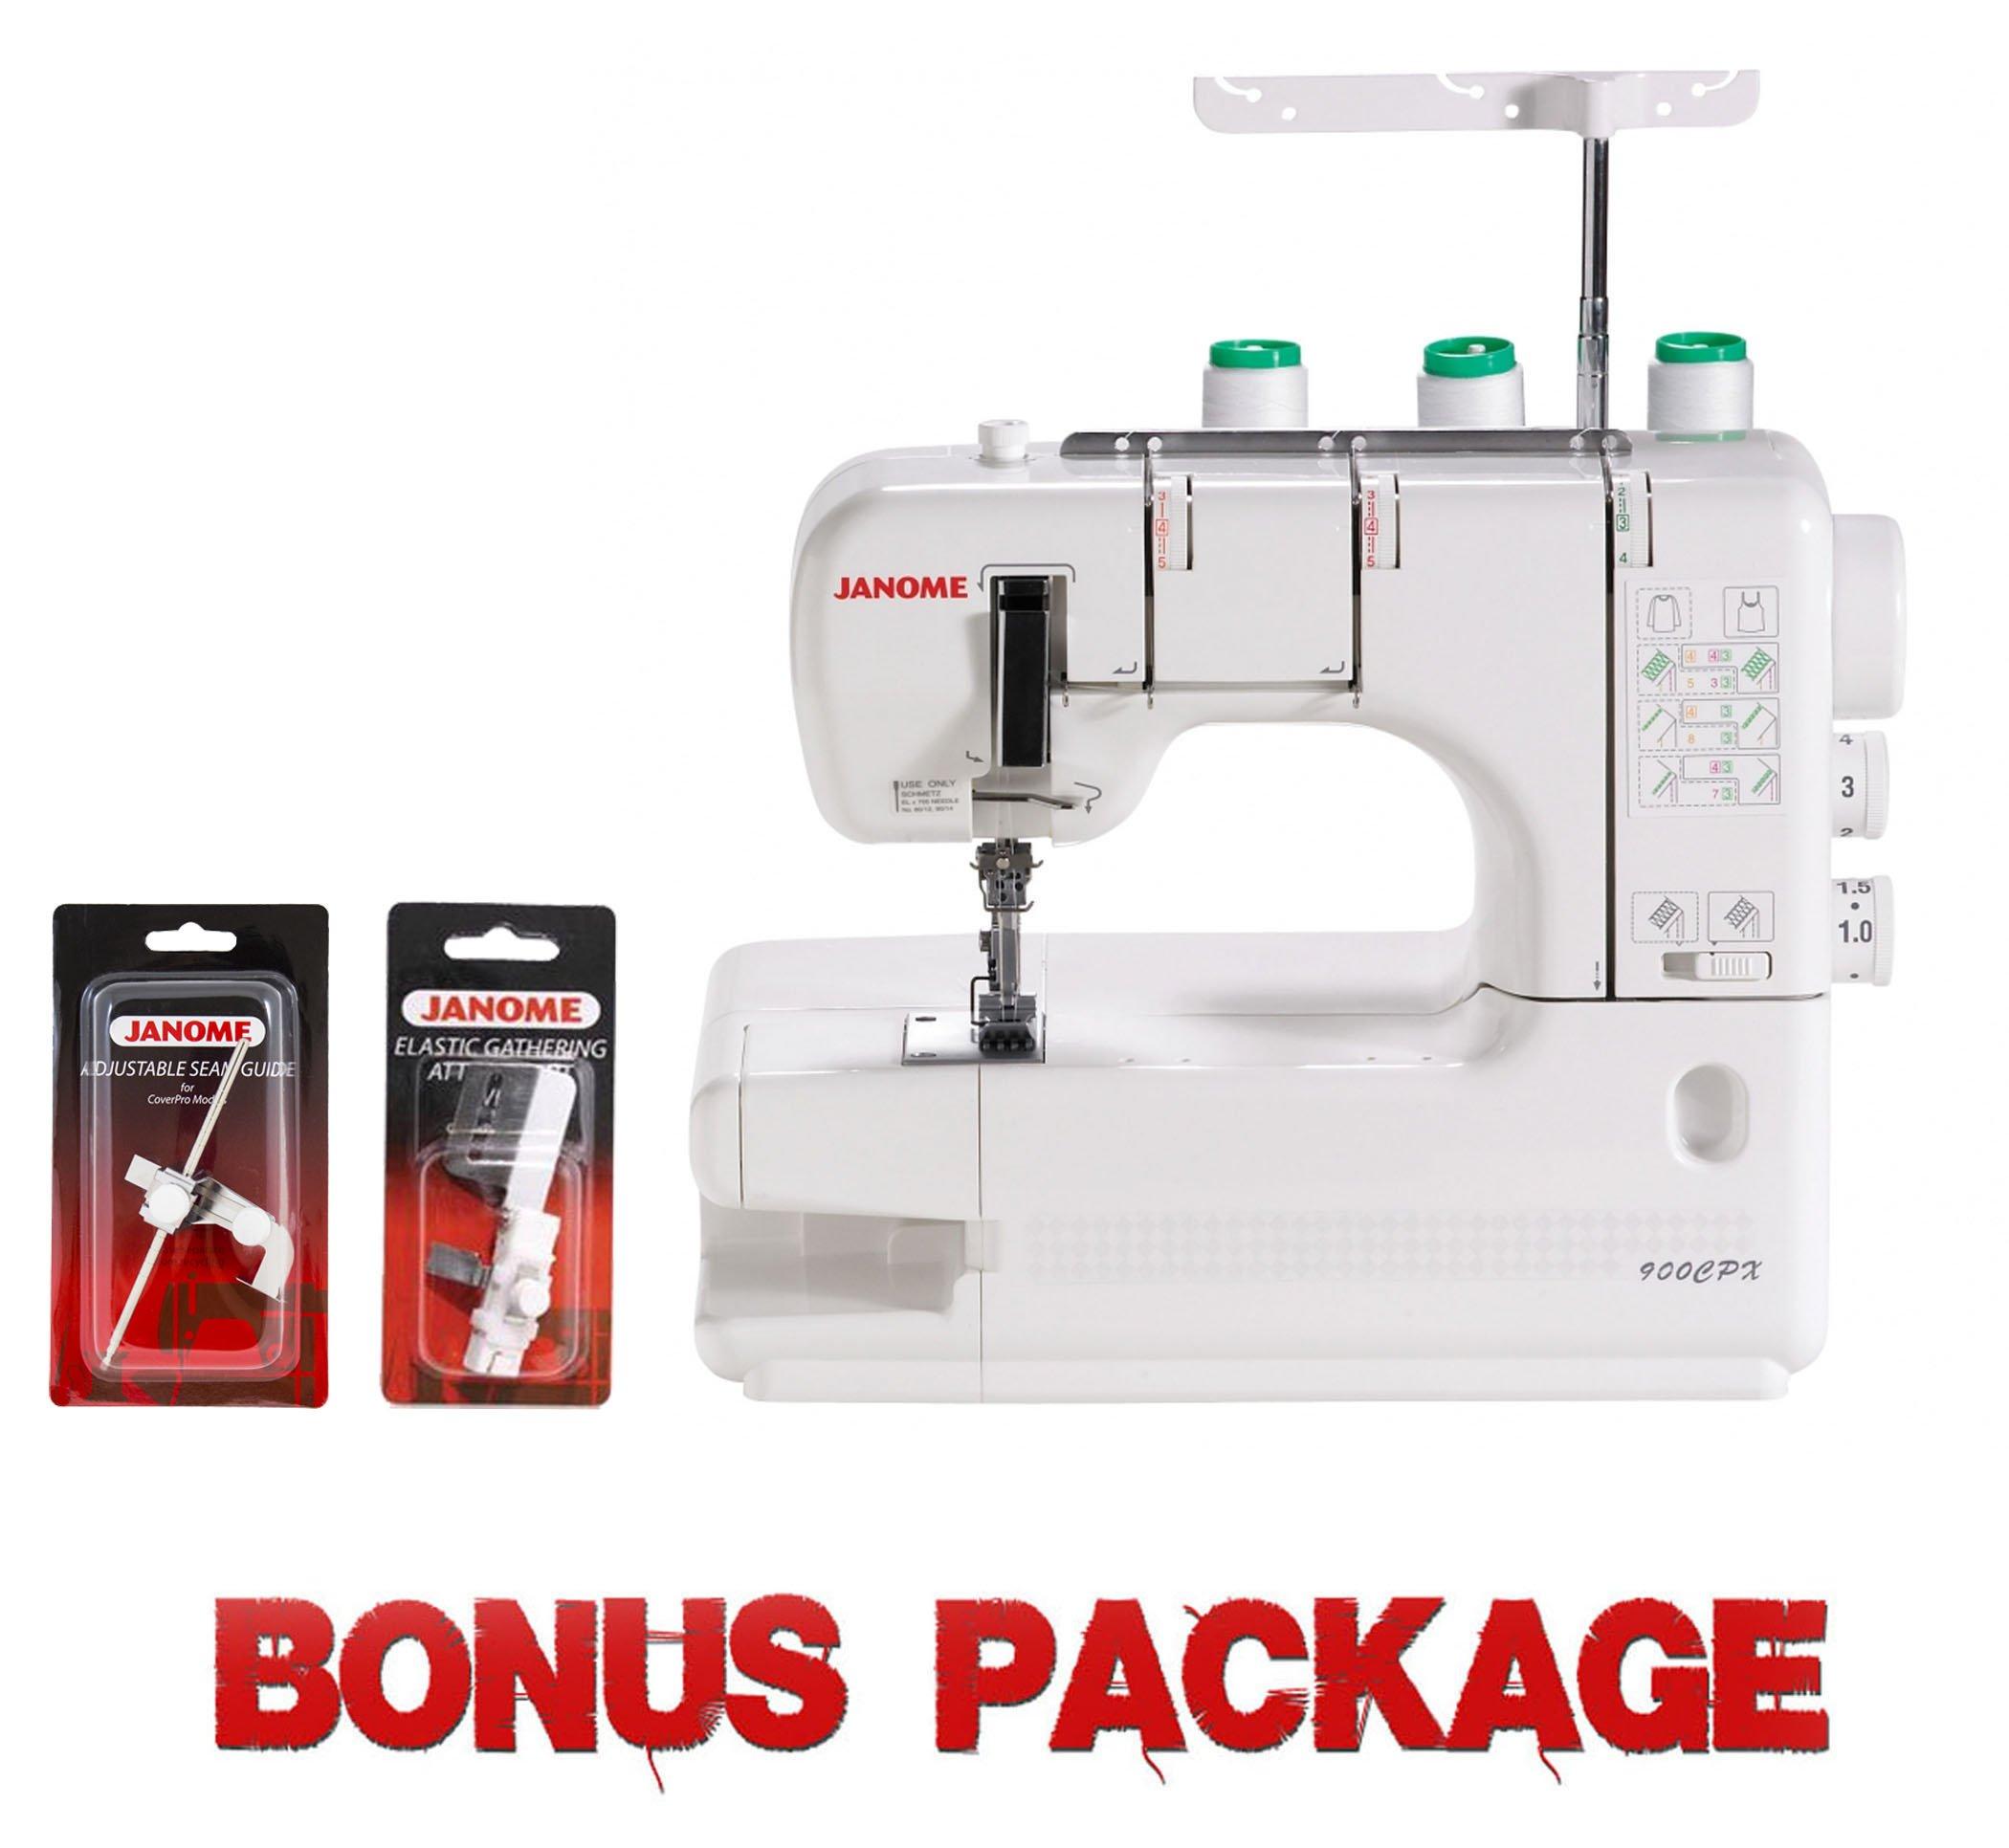 Janome CoverPro 900CPX Portable CoverHem Serger Machine With Bonus by Janome